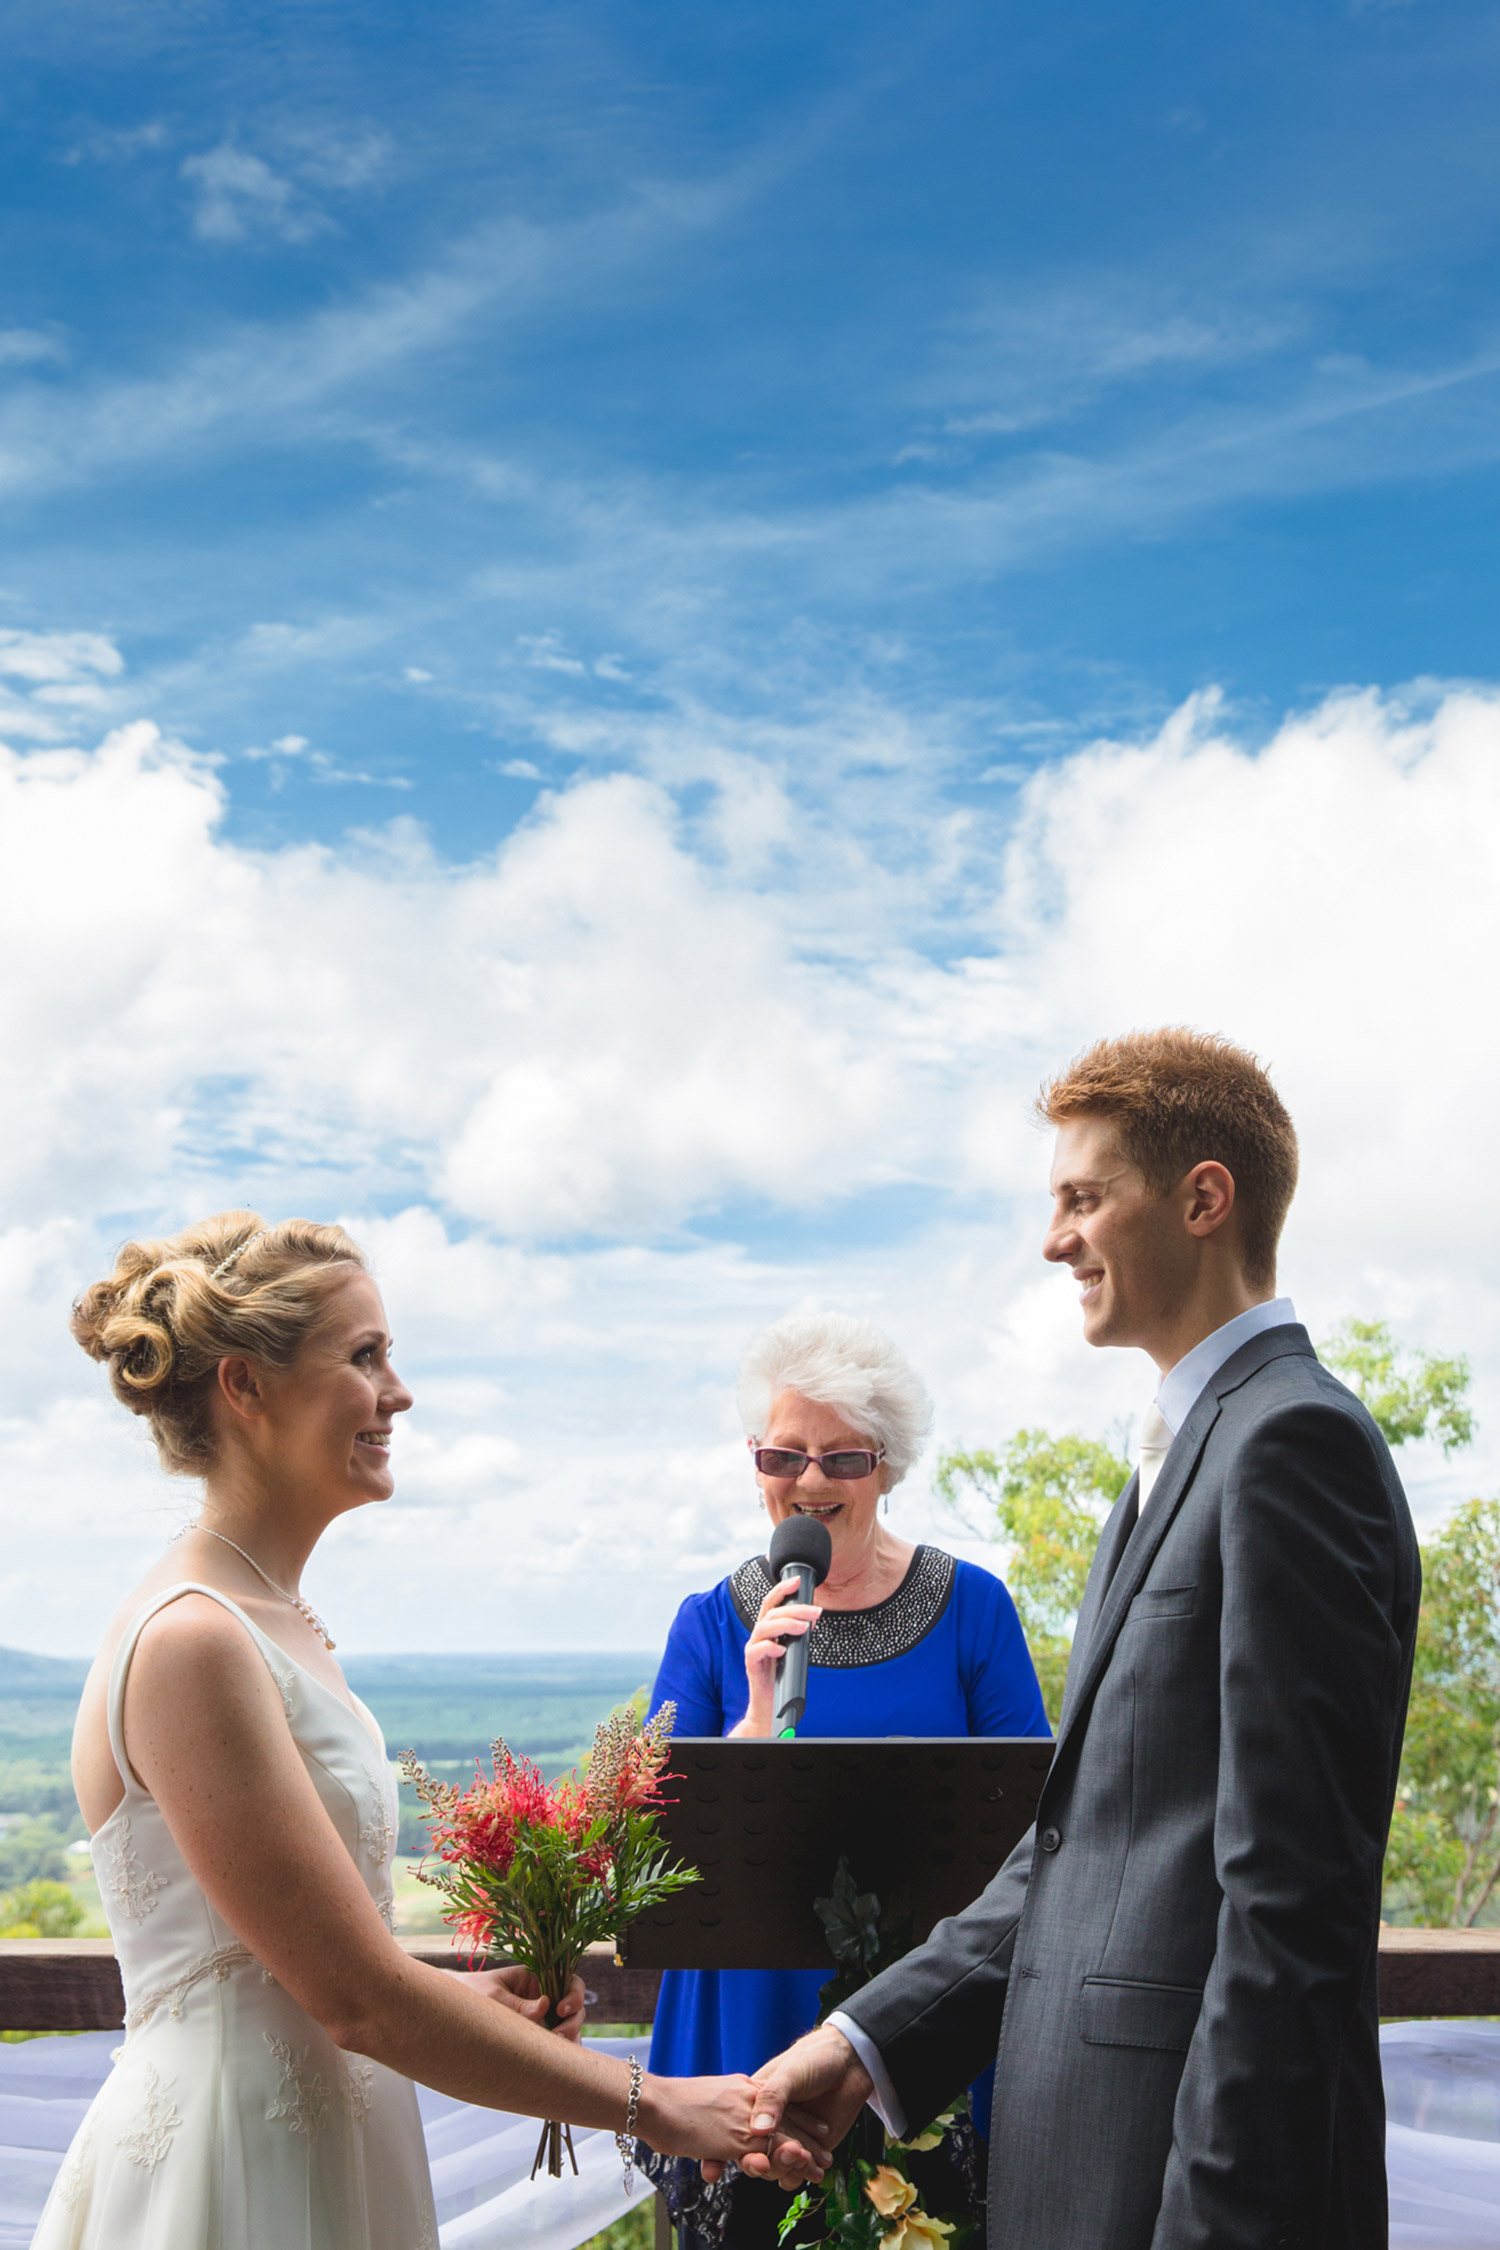 44-sunshine-coast-wedding-photography-all-the-love-in-the-world-noosa-mooloolaba-glasshouse-brisbane-katie-ryan7151.jpg